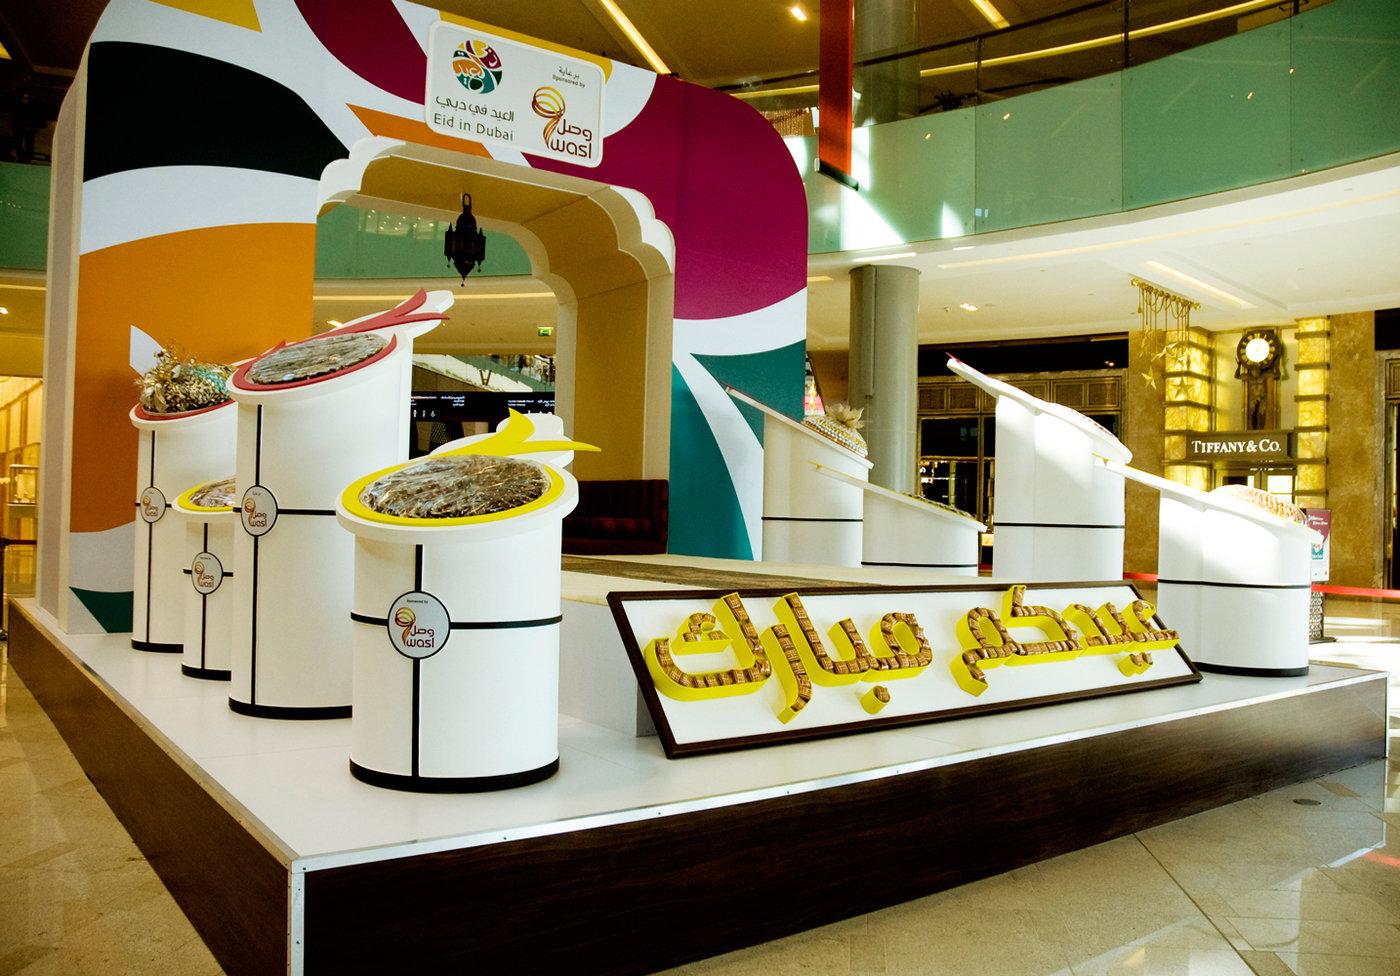 Exhibition Stand Designer Jobs In Dubai : Exhibition stands by bigdot design at coroflot